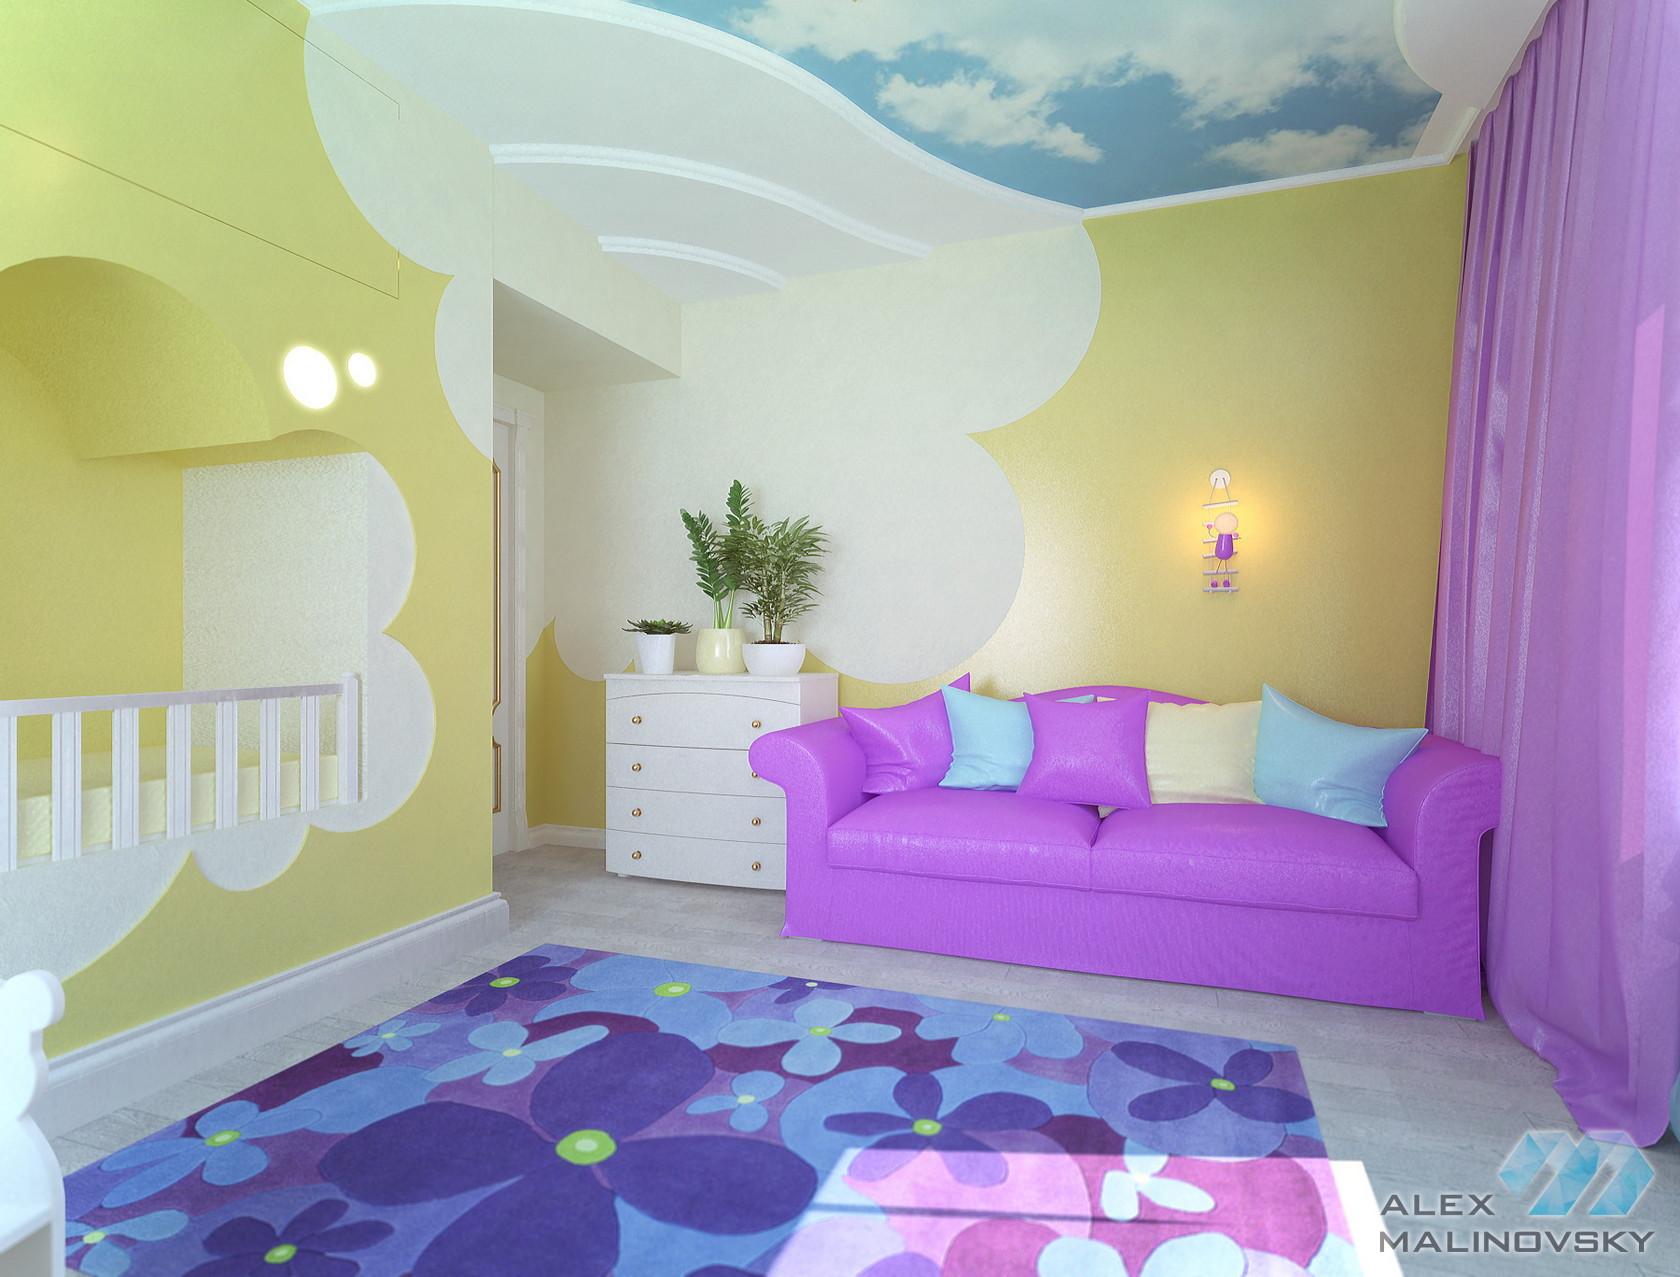 Детская 1, 4х комнатная квартира, ЖК Парус, СПб